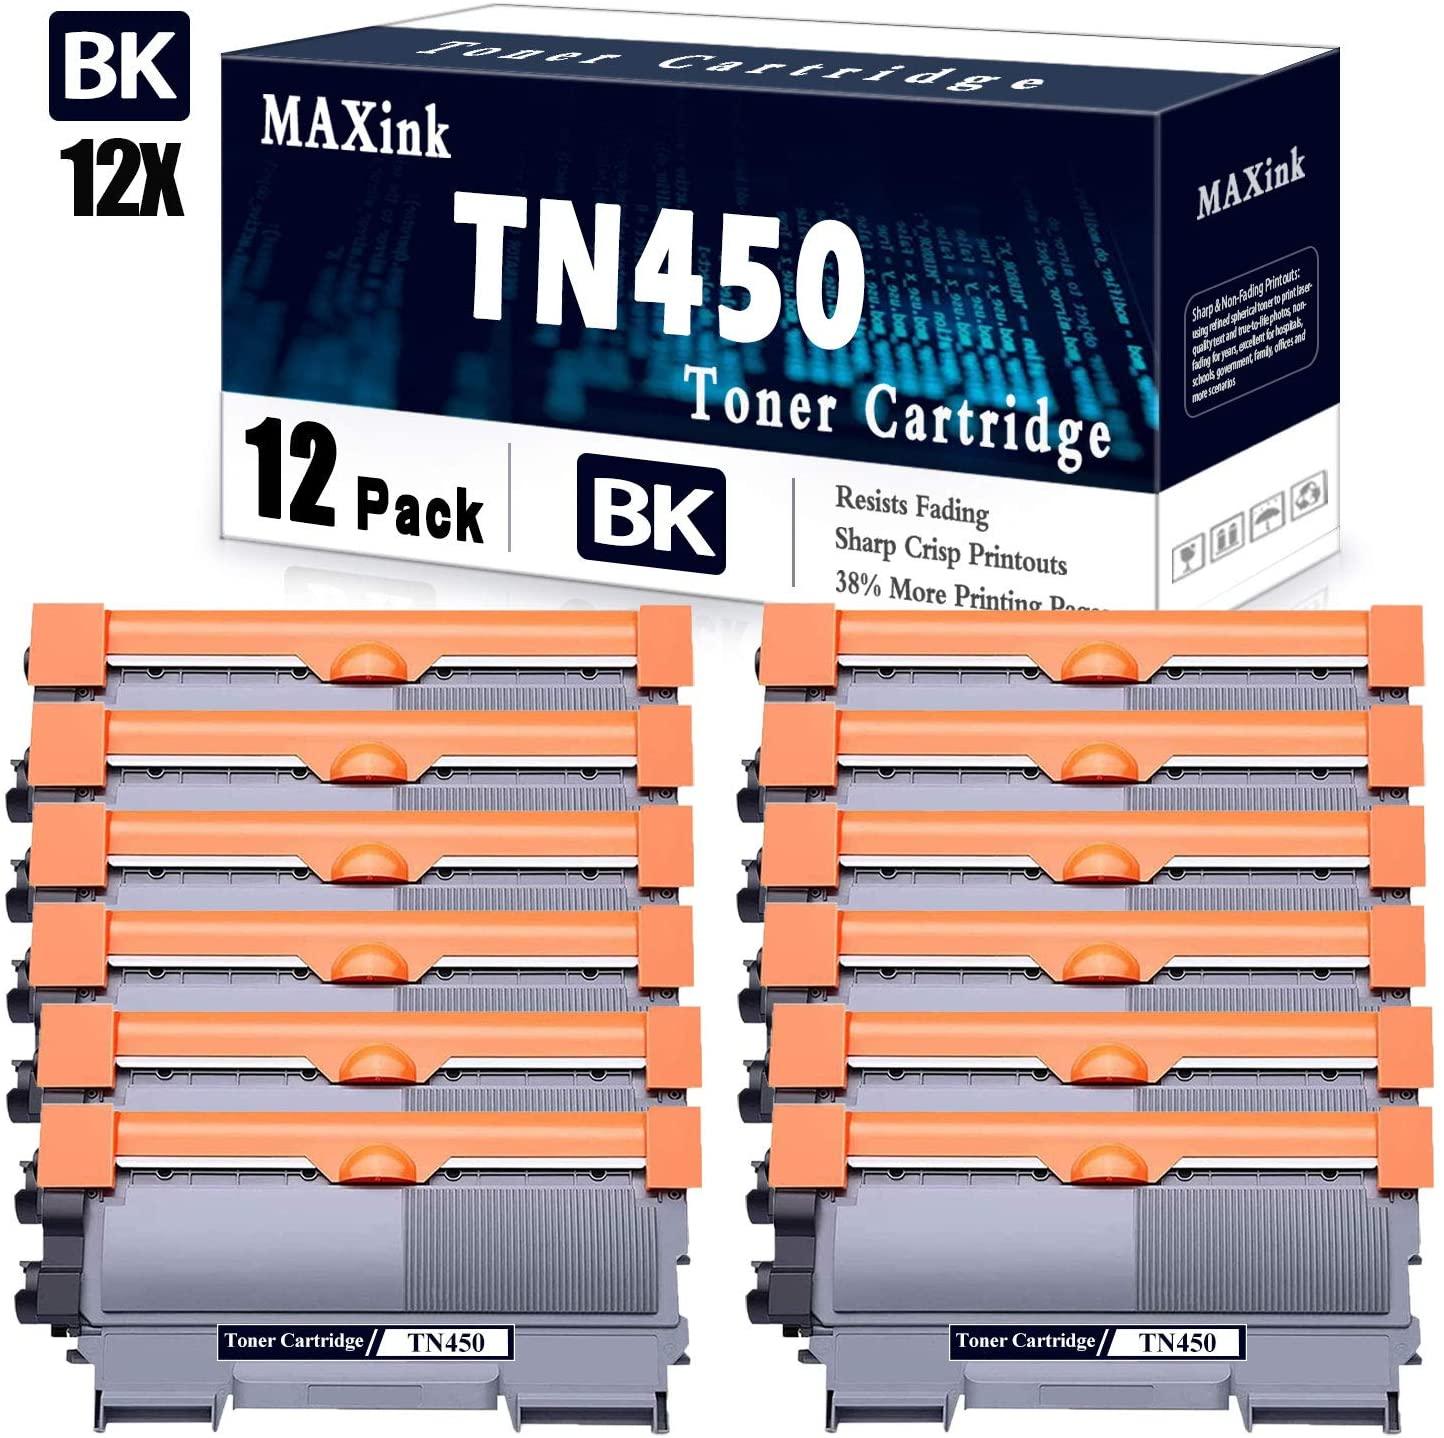 Compatible 12-Pack Black TN450 High Yield Toner Cartridge Replacement for Brother DCP-7060D,MFC-7240,MFC-7360N,MFC-7365DN;HL-2130,HL-2230,HL-2240,HL-2242D,HL-2250DN,HL-2275DW Printers.